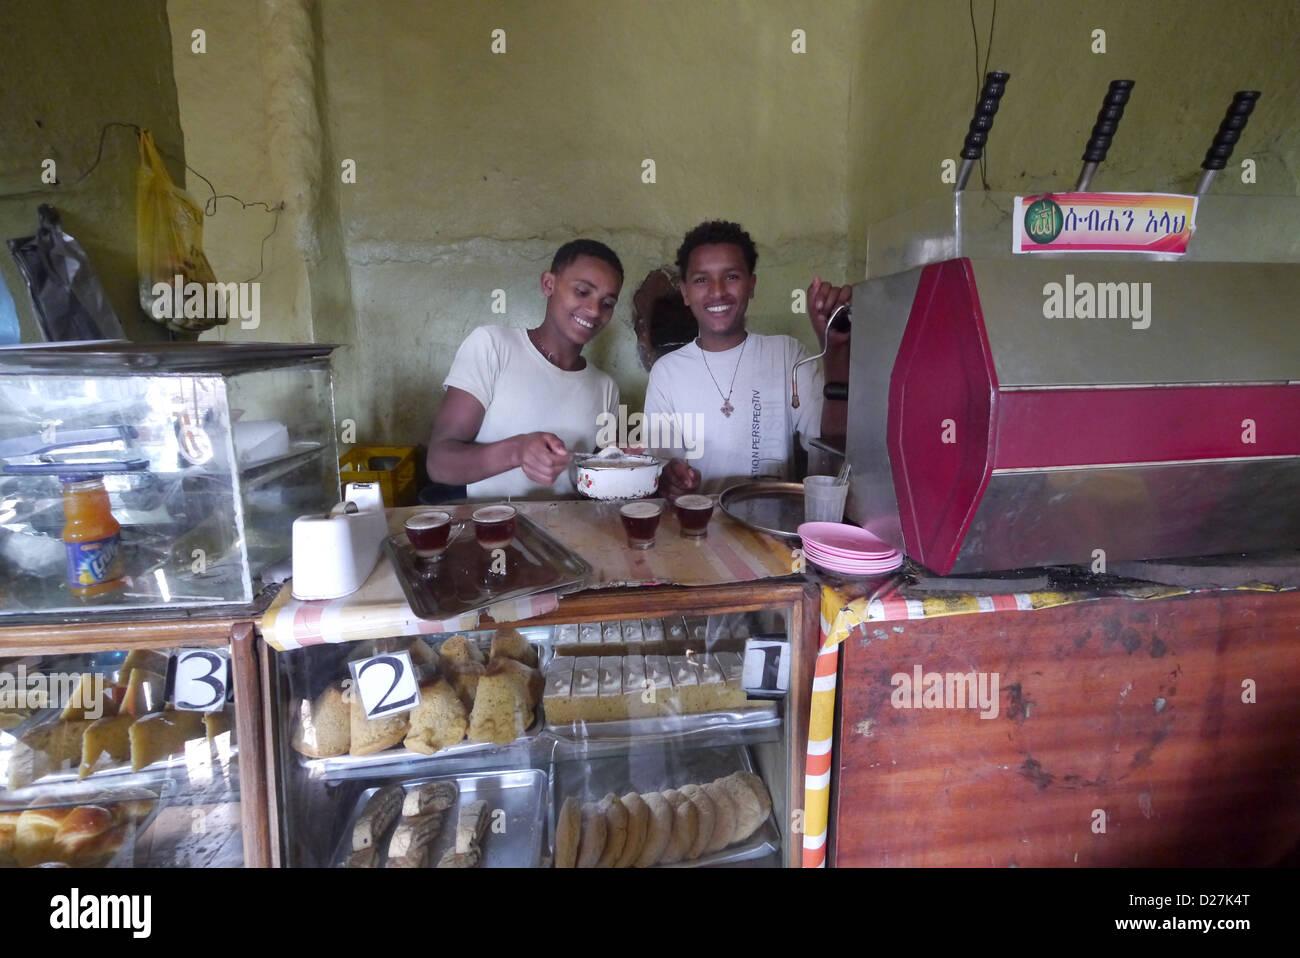 ETHIOPIA The 'Salam Cafe' in Chagni, Beni Shangul Gumuz region. Employees using espresso machine. Stock Photo